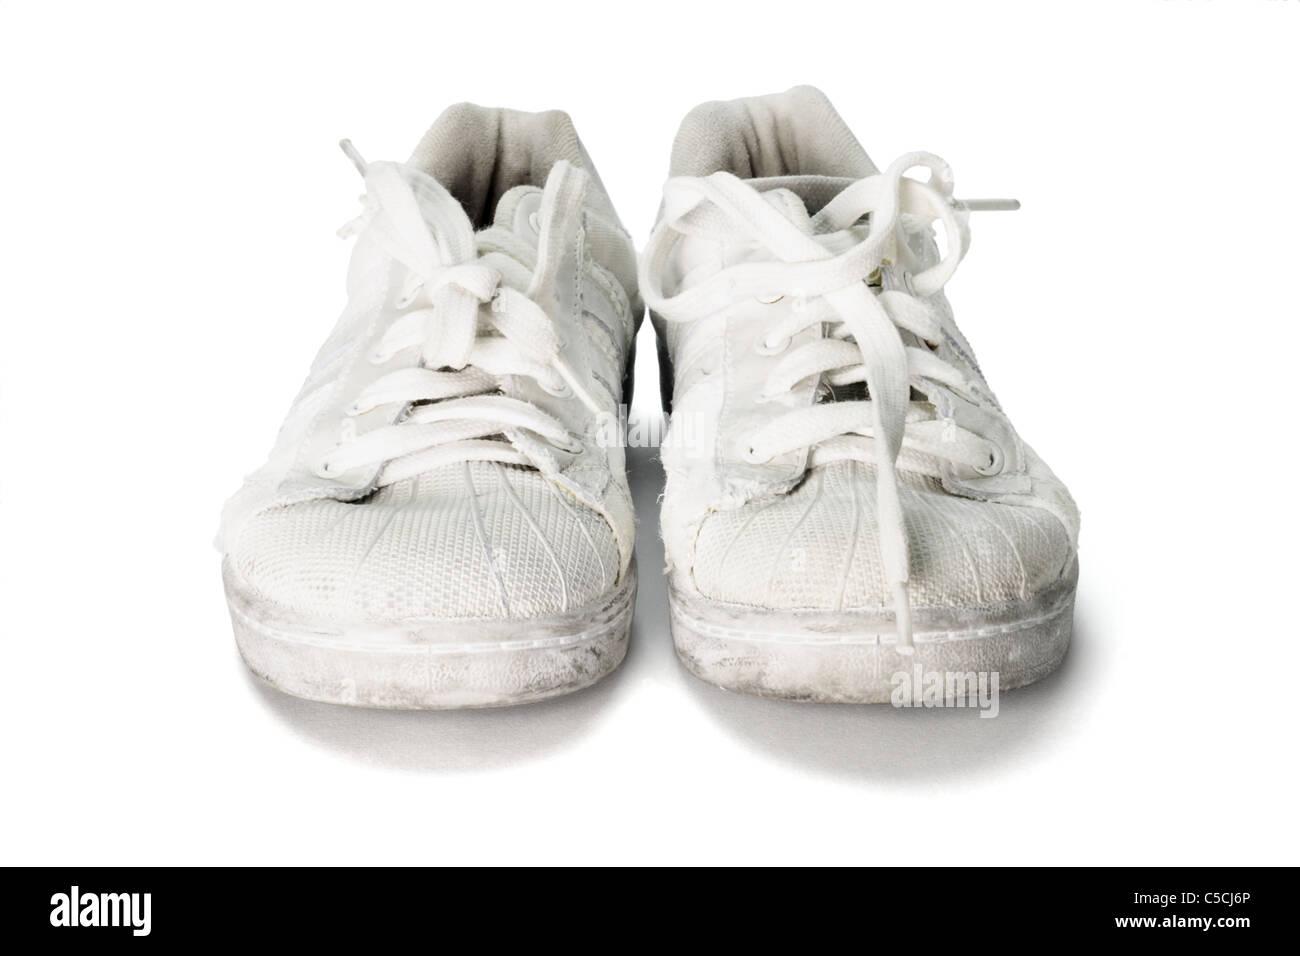 Alte Sneaker Schuhe Stockfotos & Alte Sneaker Schuhe Bilder